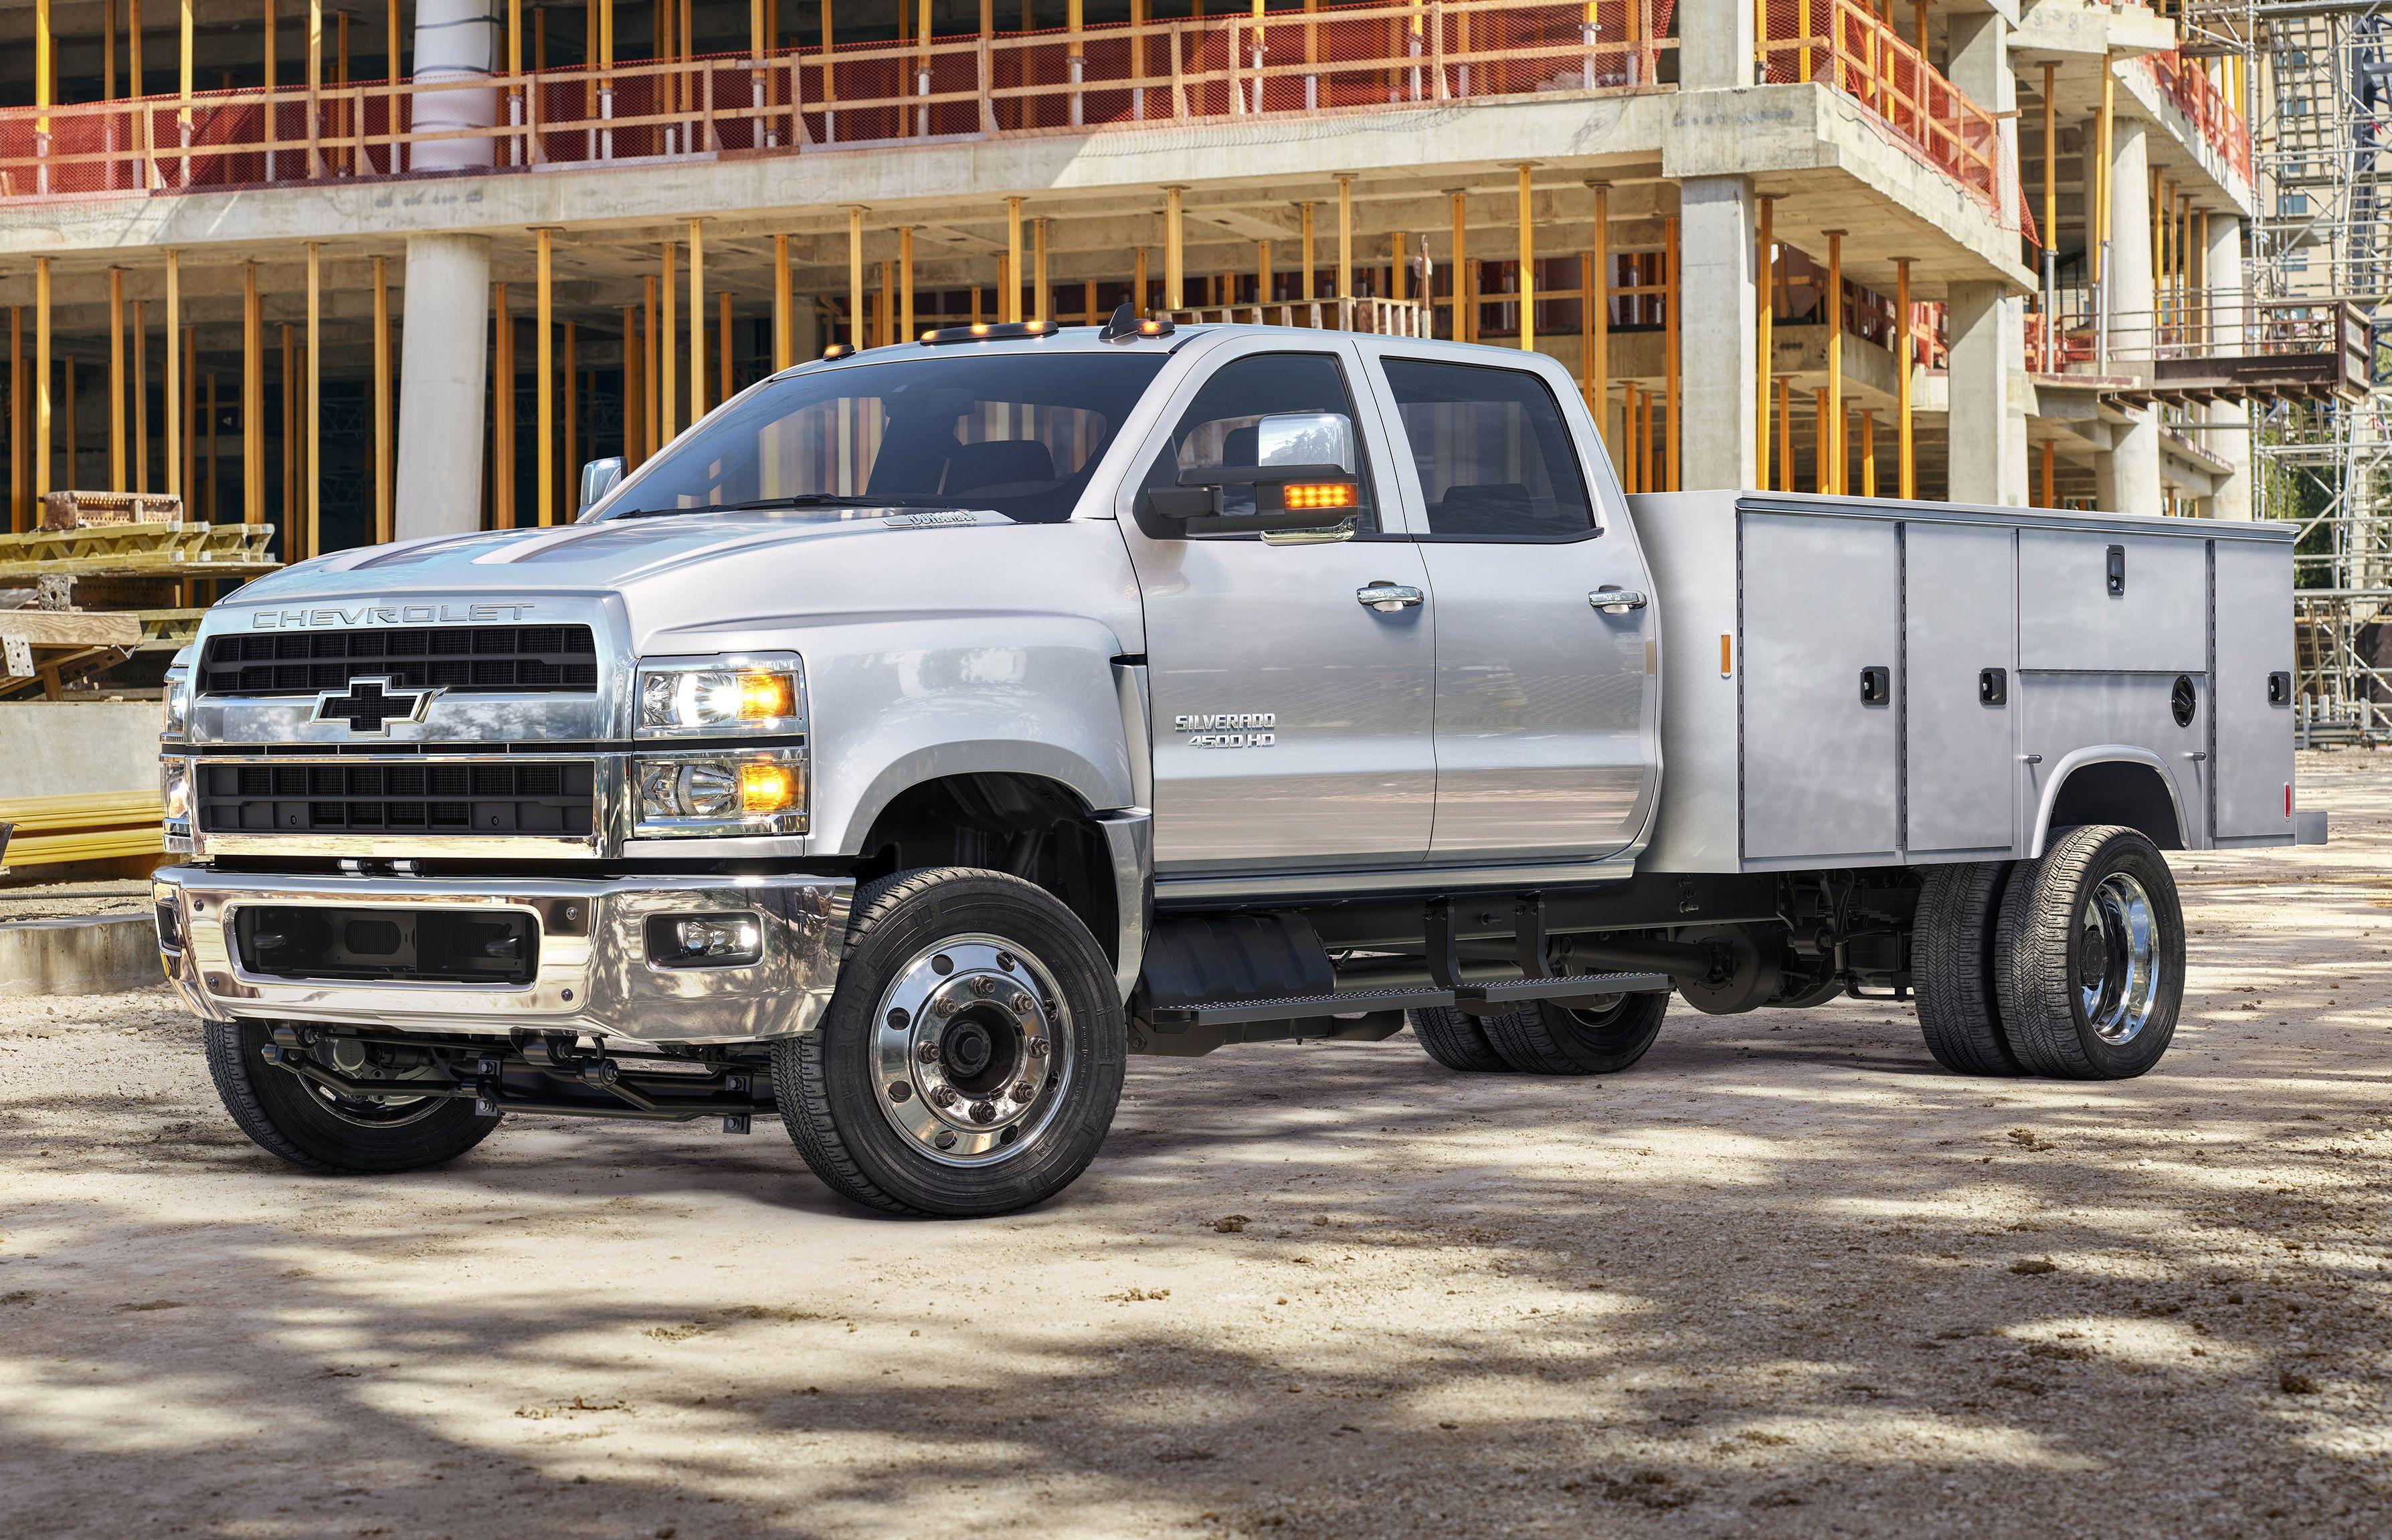 2020 Silverado Hd Rumors And Price Medium Duty Trucks Chevrolet